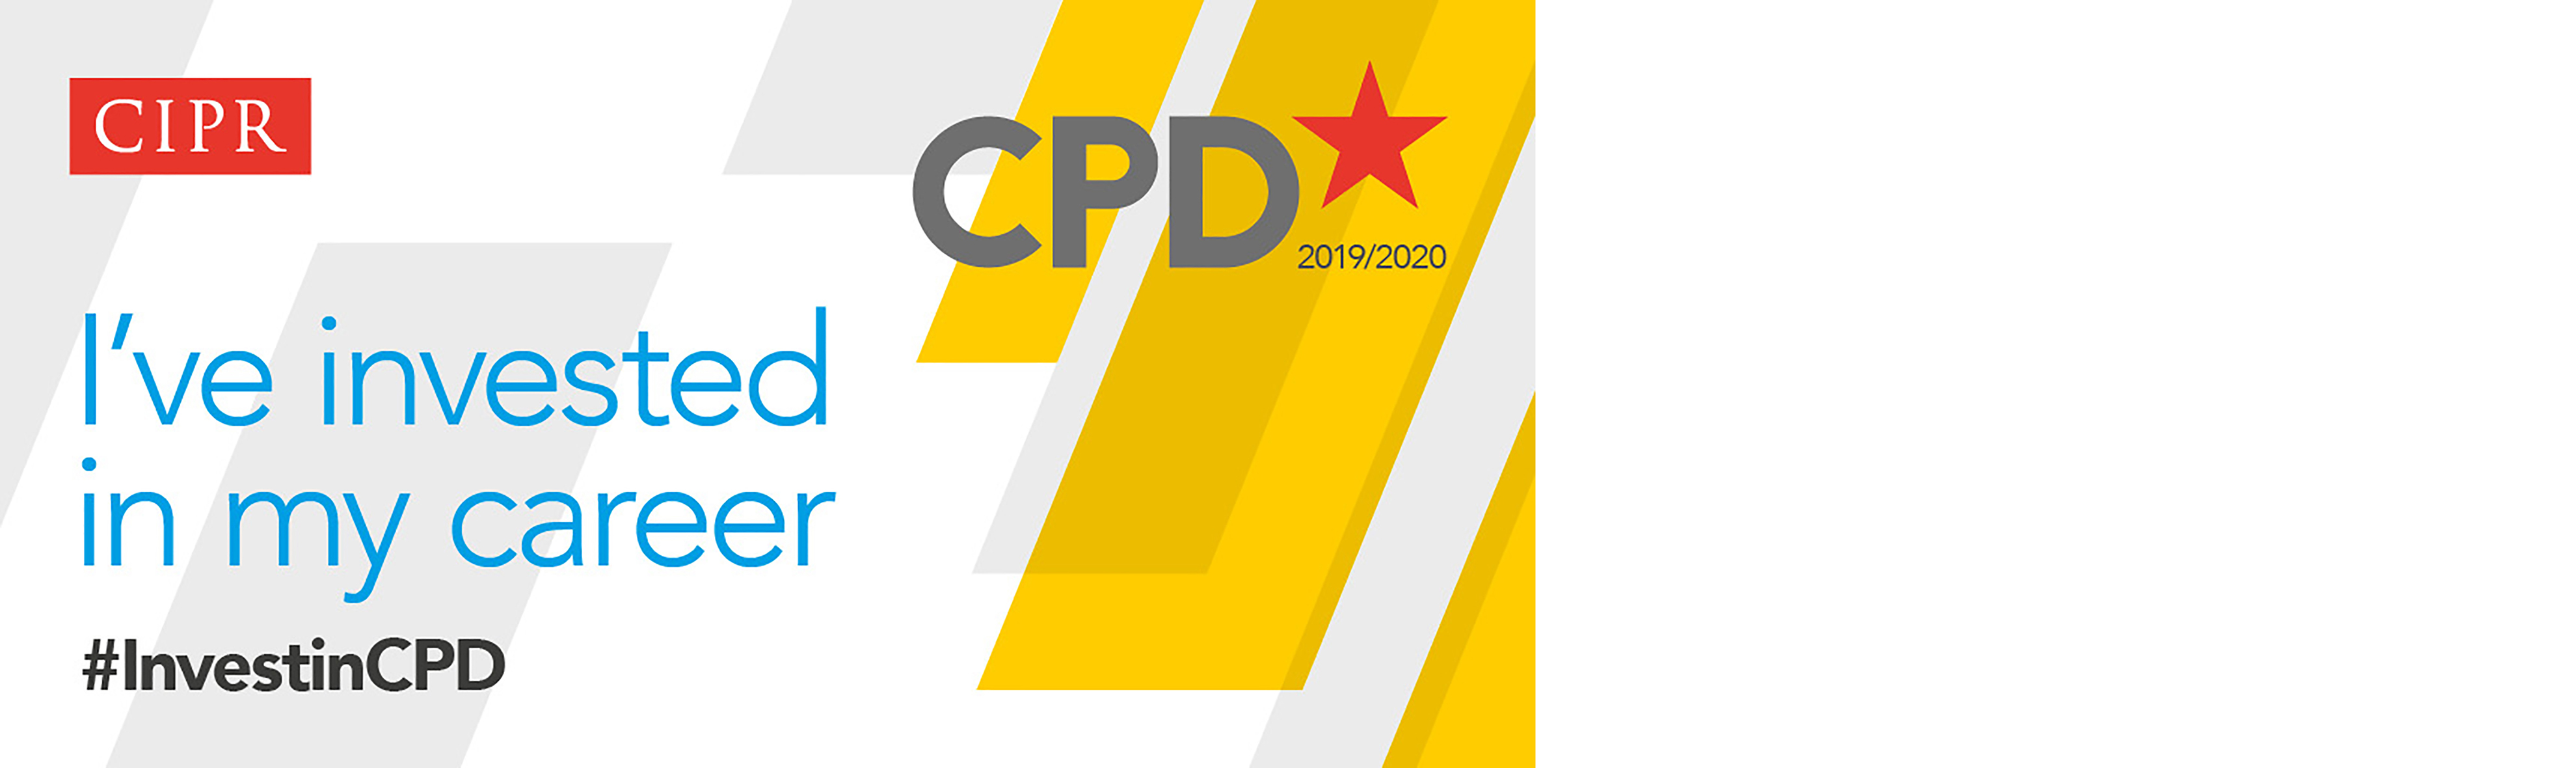 I've invested in my career. CIPR CPD logo